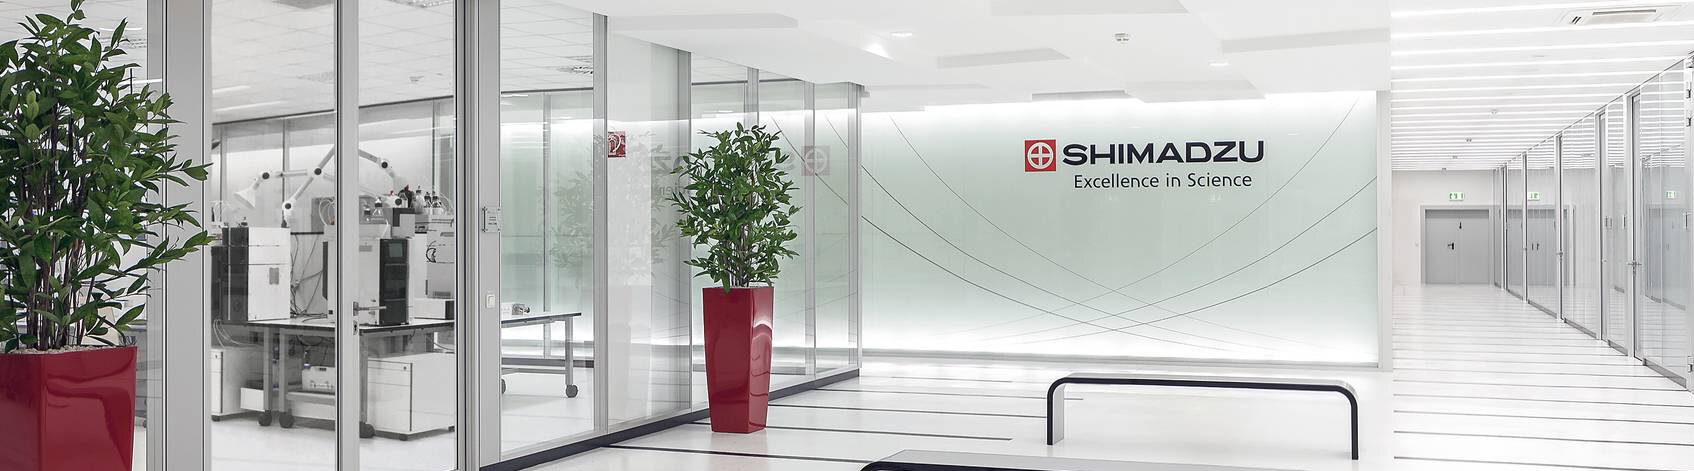 Company banner of Shimadzu Europa GmbH